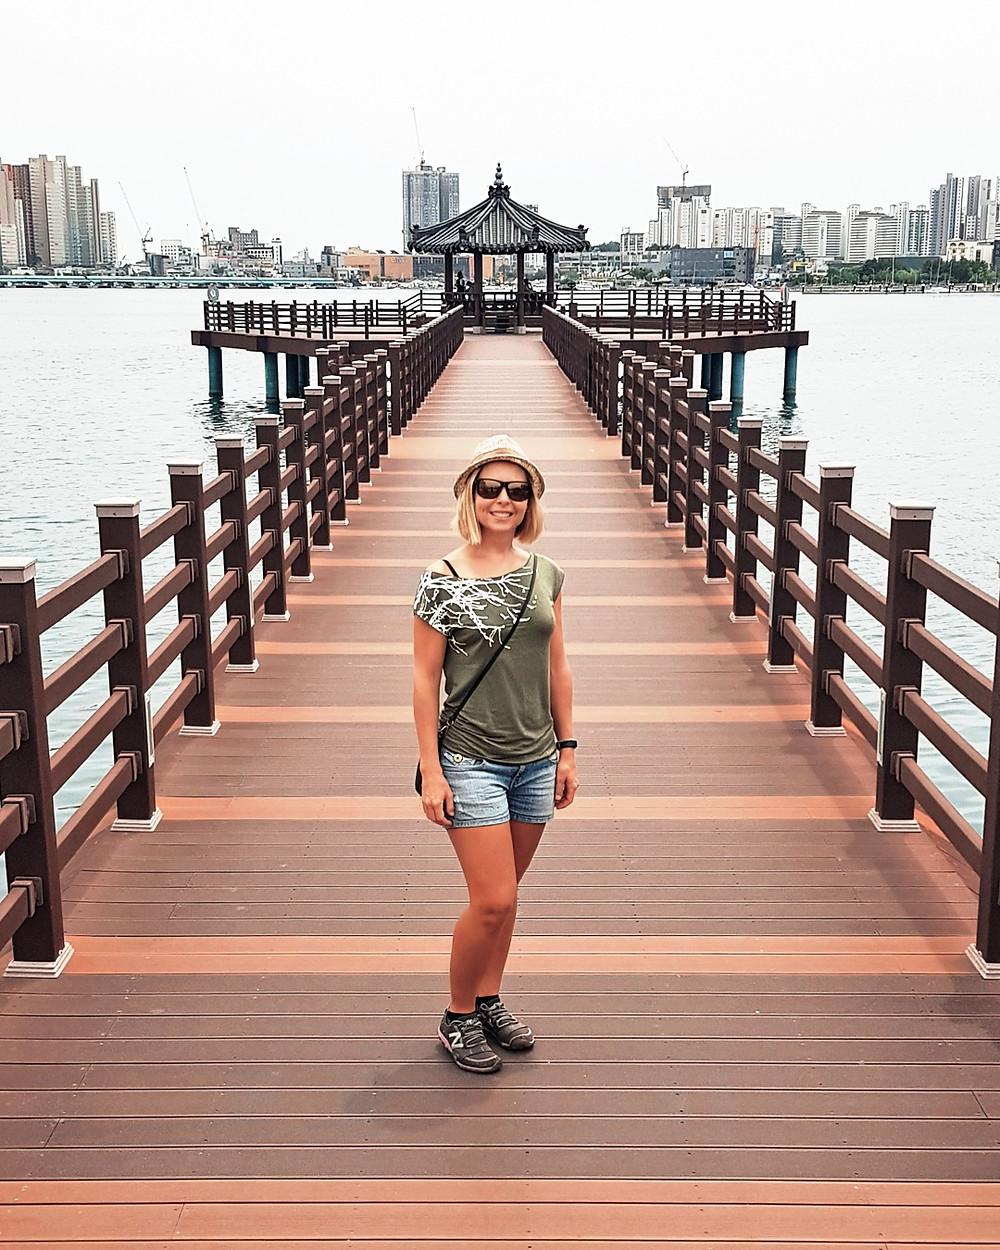 CHEONGCHOHO LAKE sokcho korea cheongchojeong pavillion